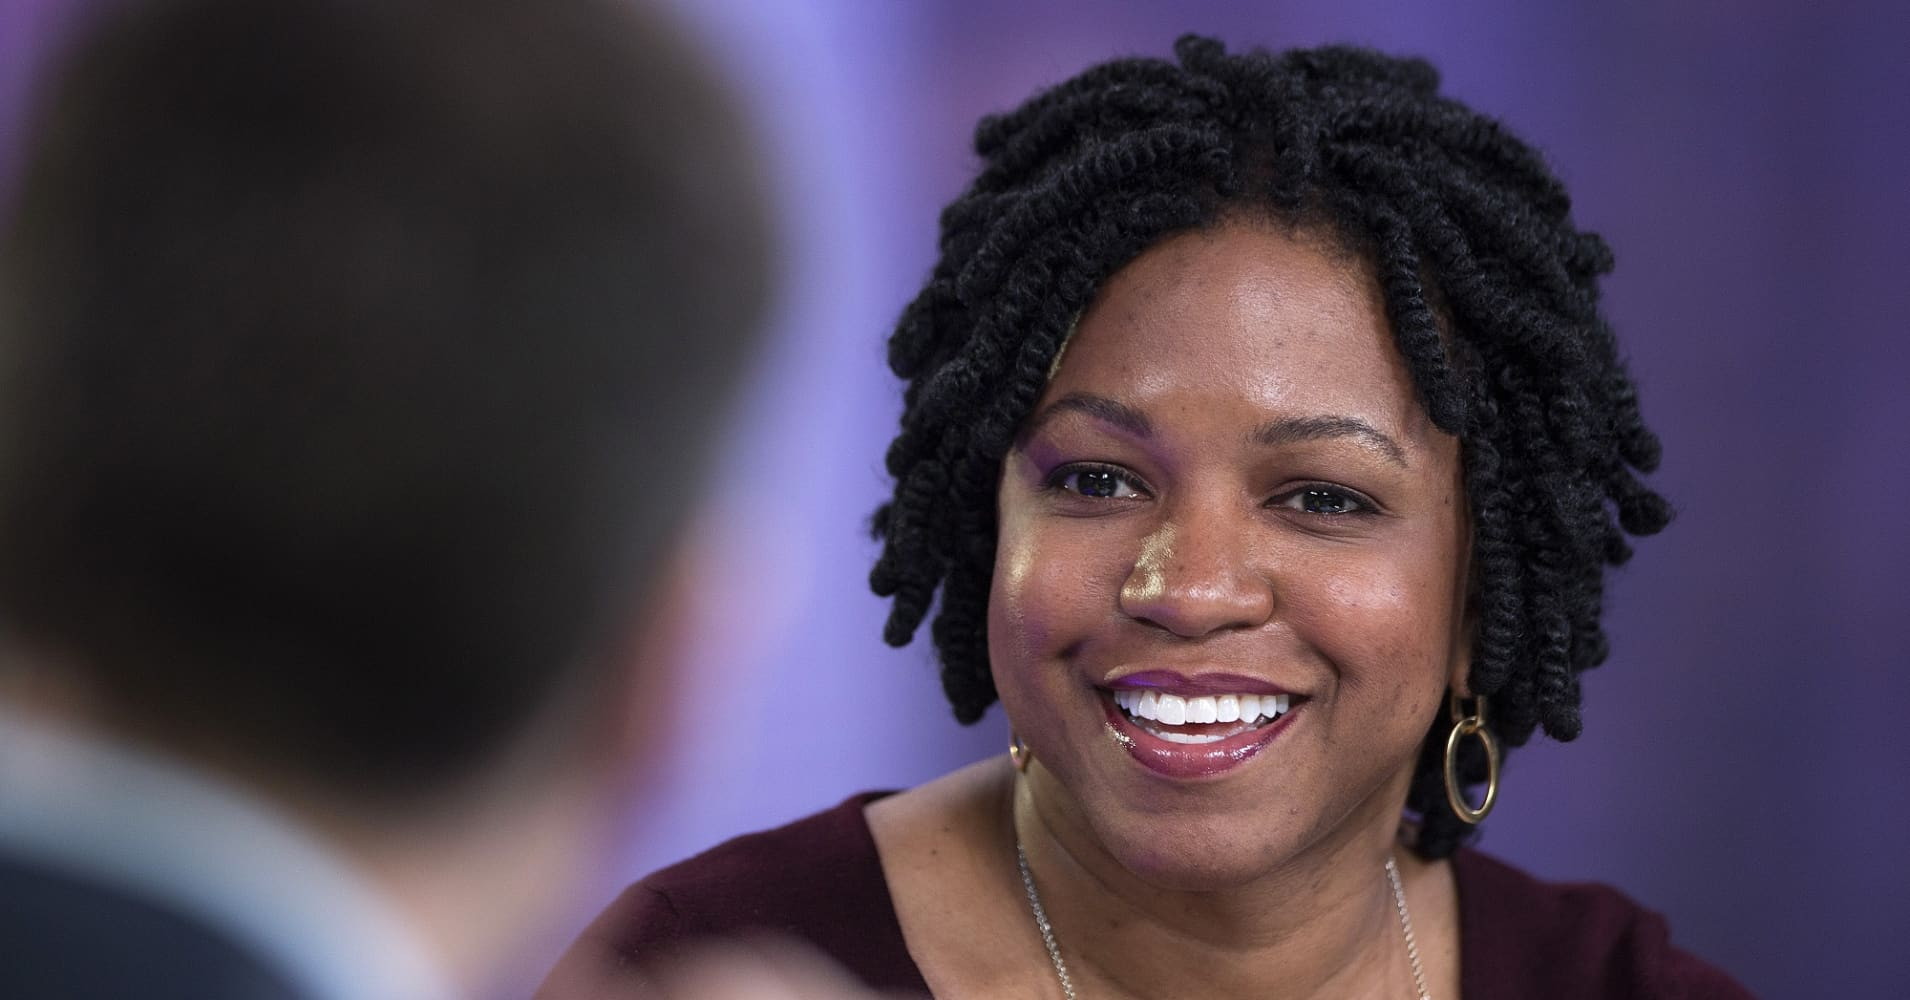 TaskRabbit CEO Stacy Brown-Philpot